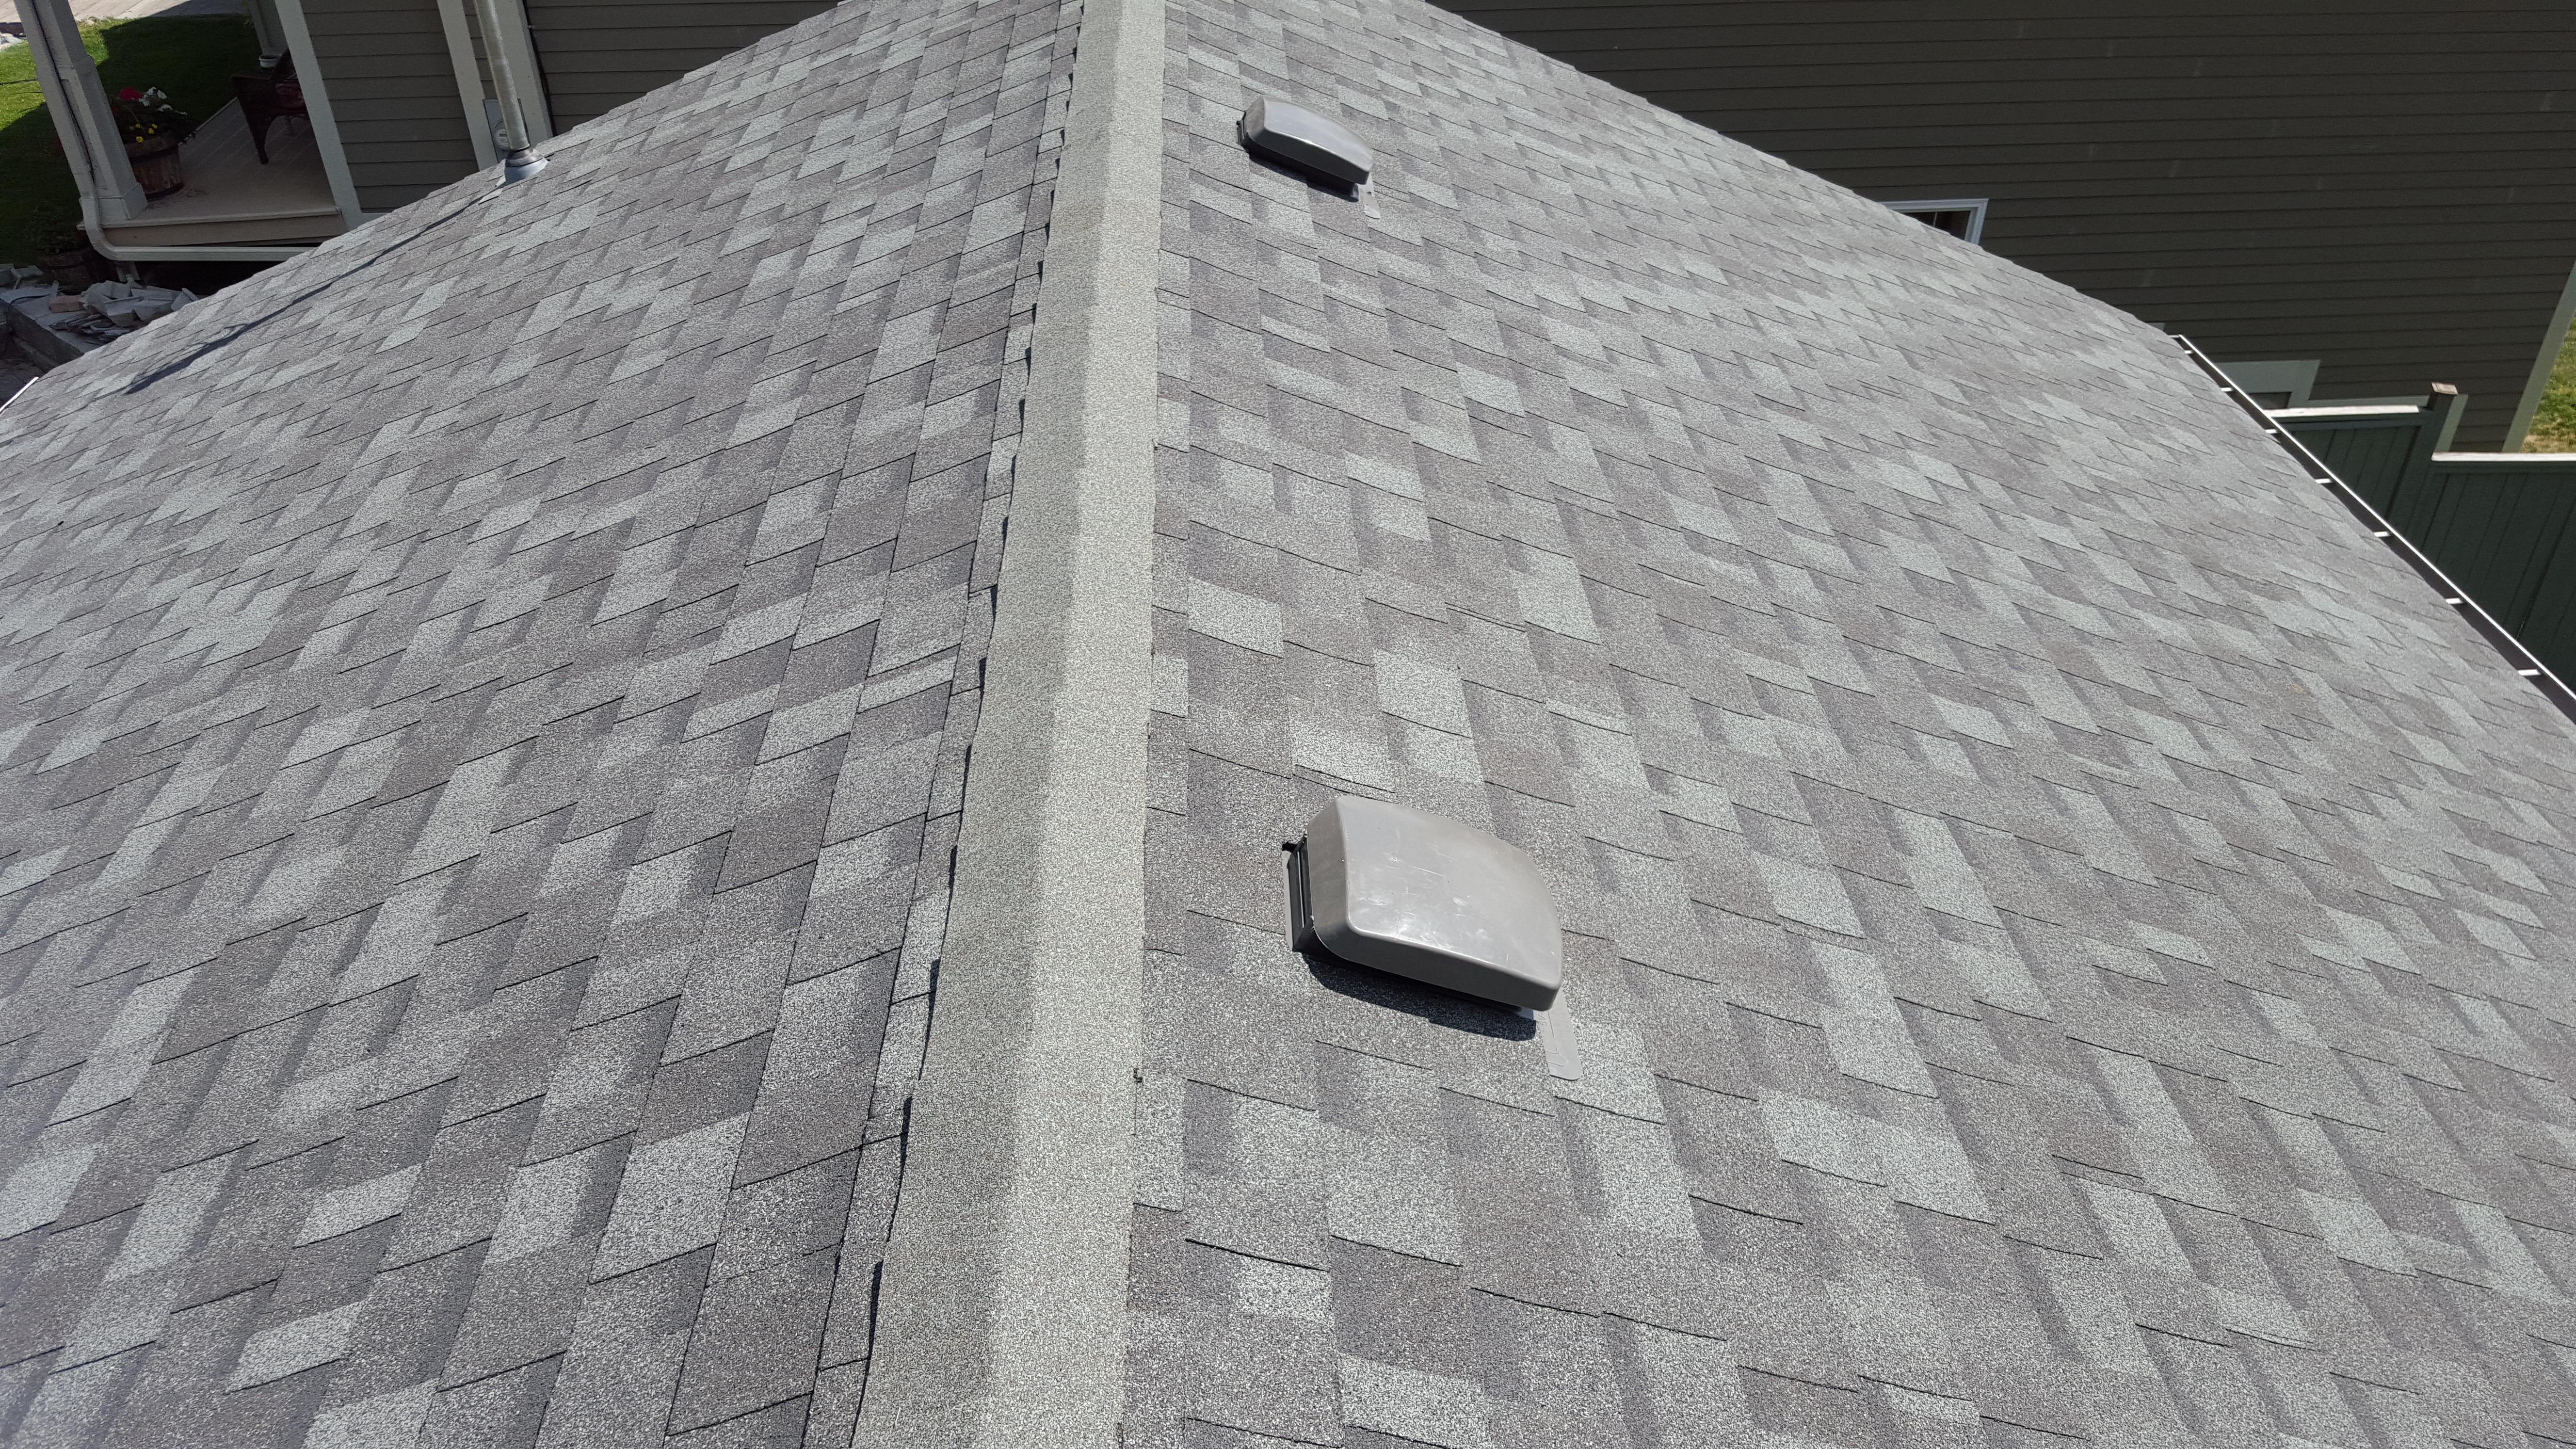 IKO Shingles Roof